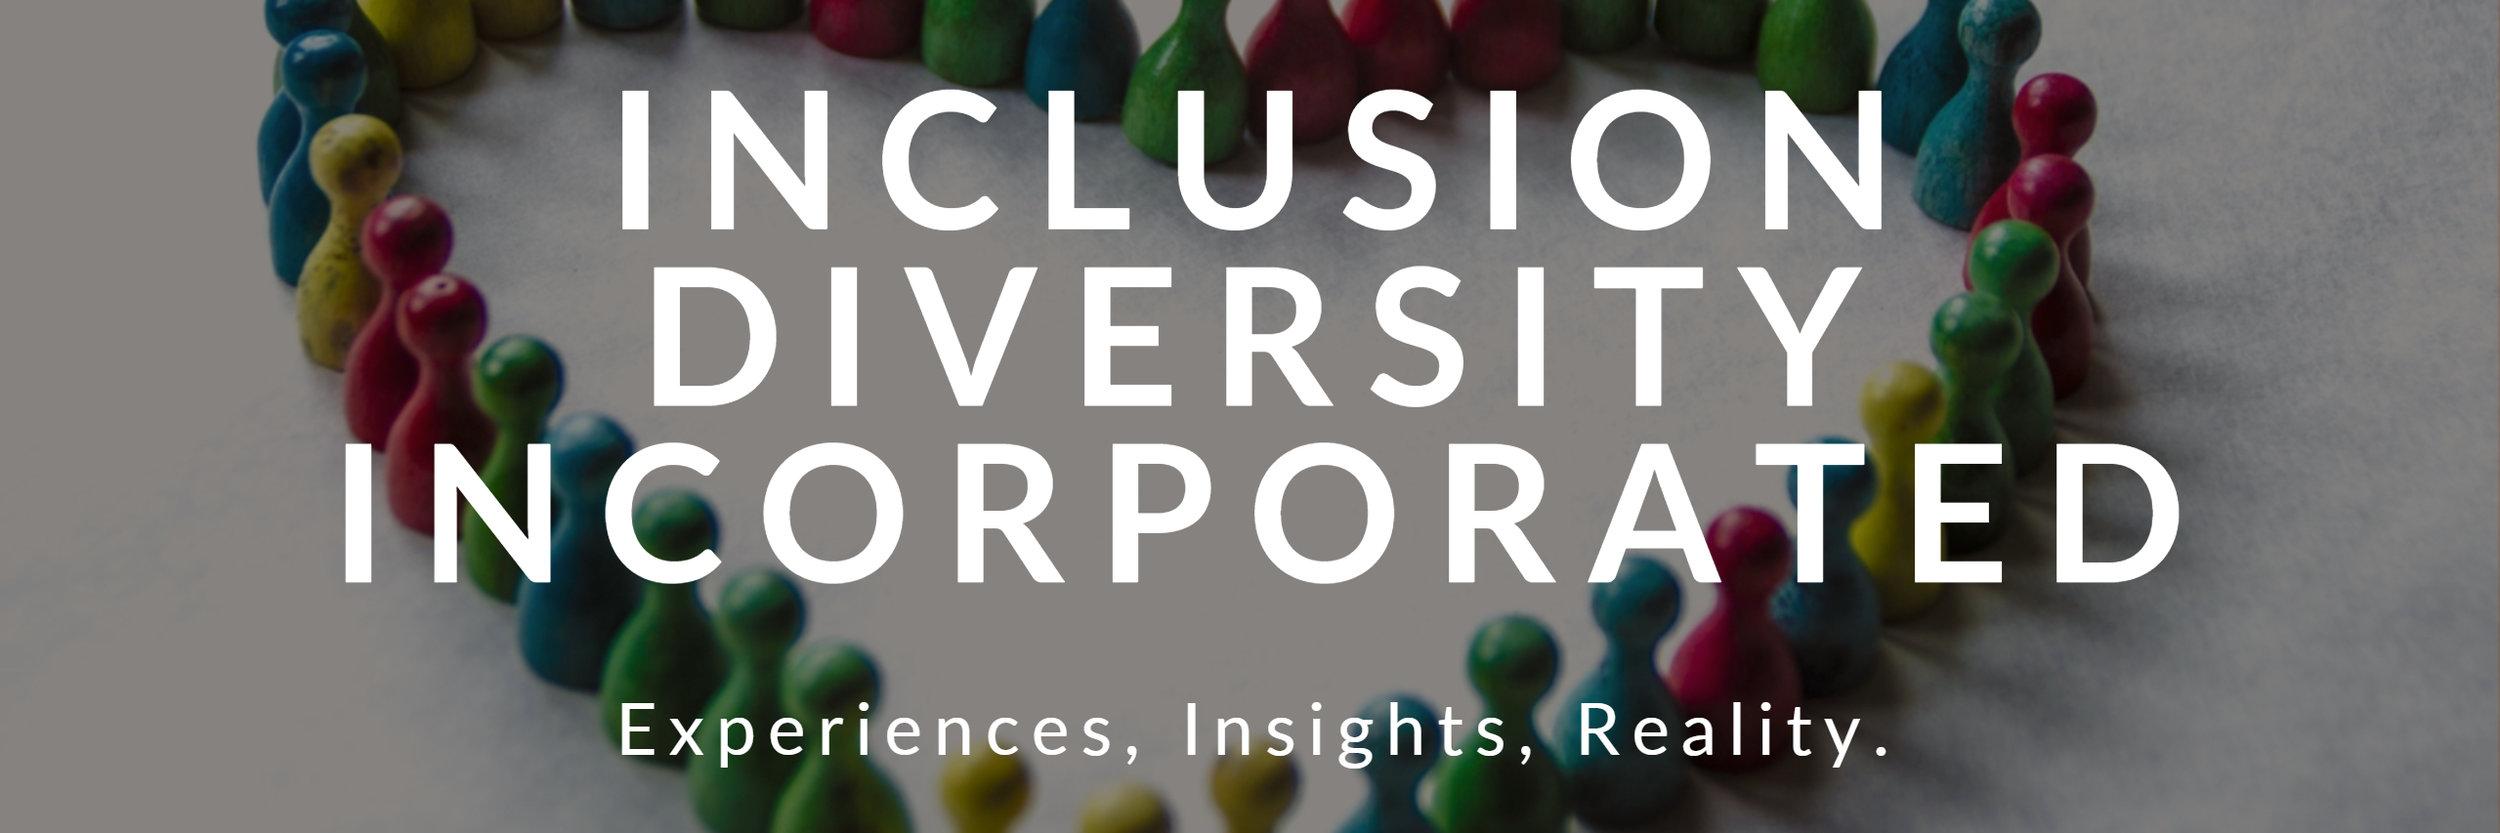 Freedom Talk Inclusion & Diversity Inc. - web Copy (2).jpg